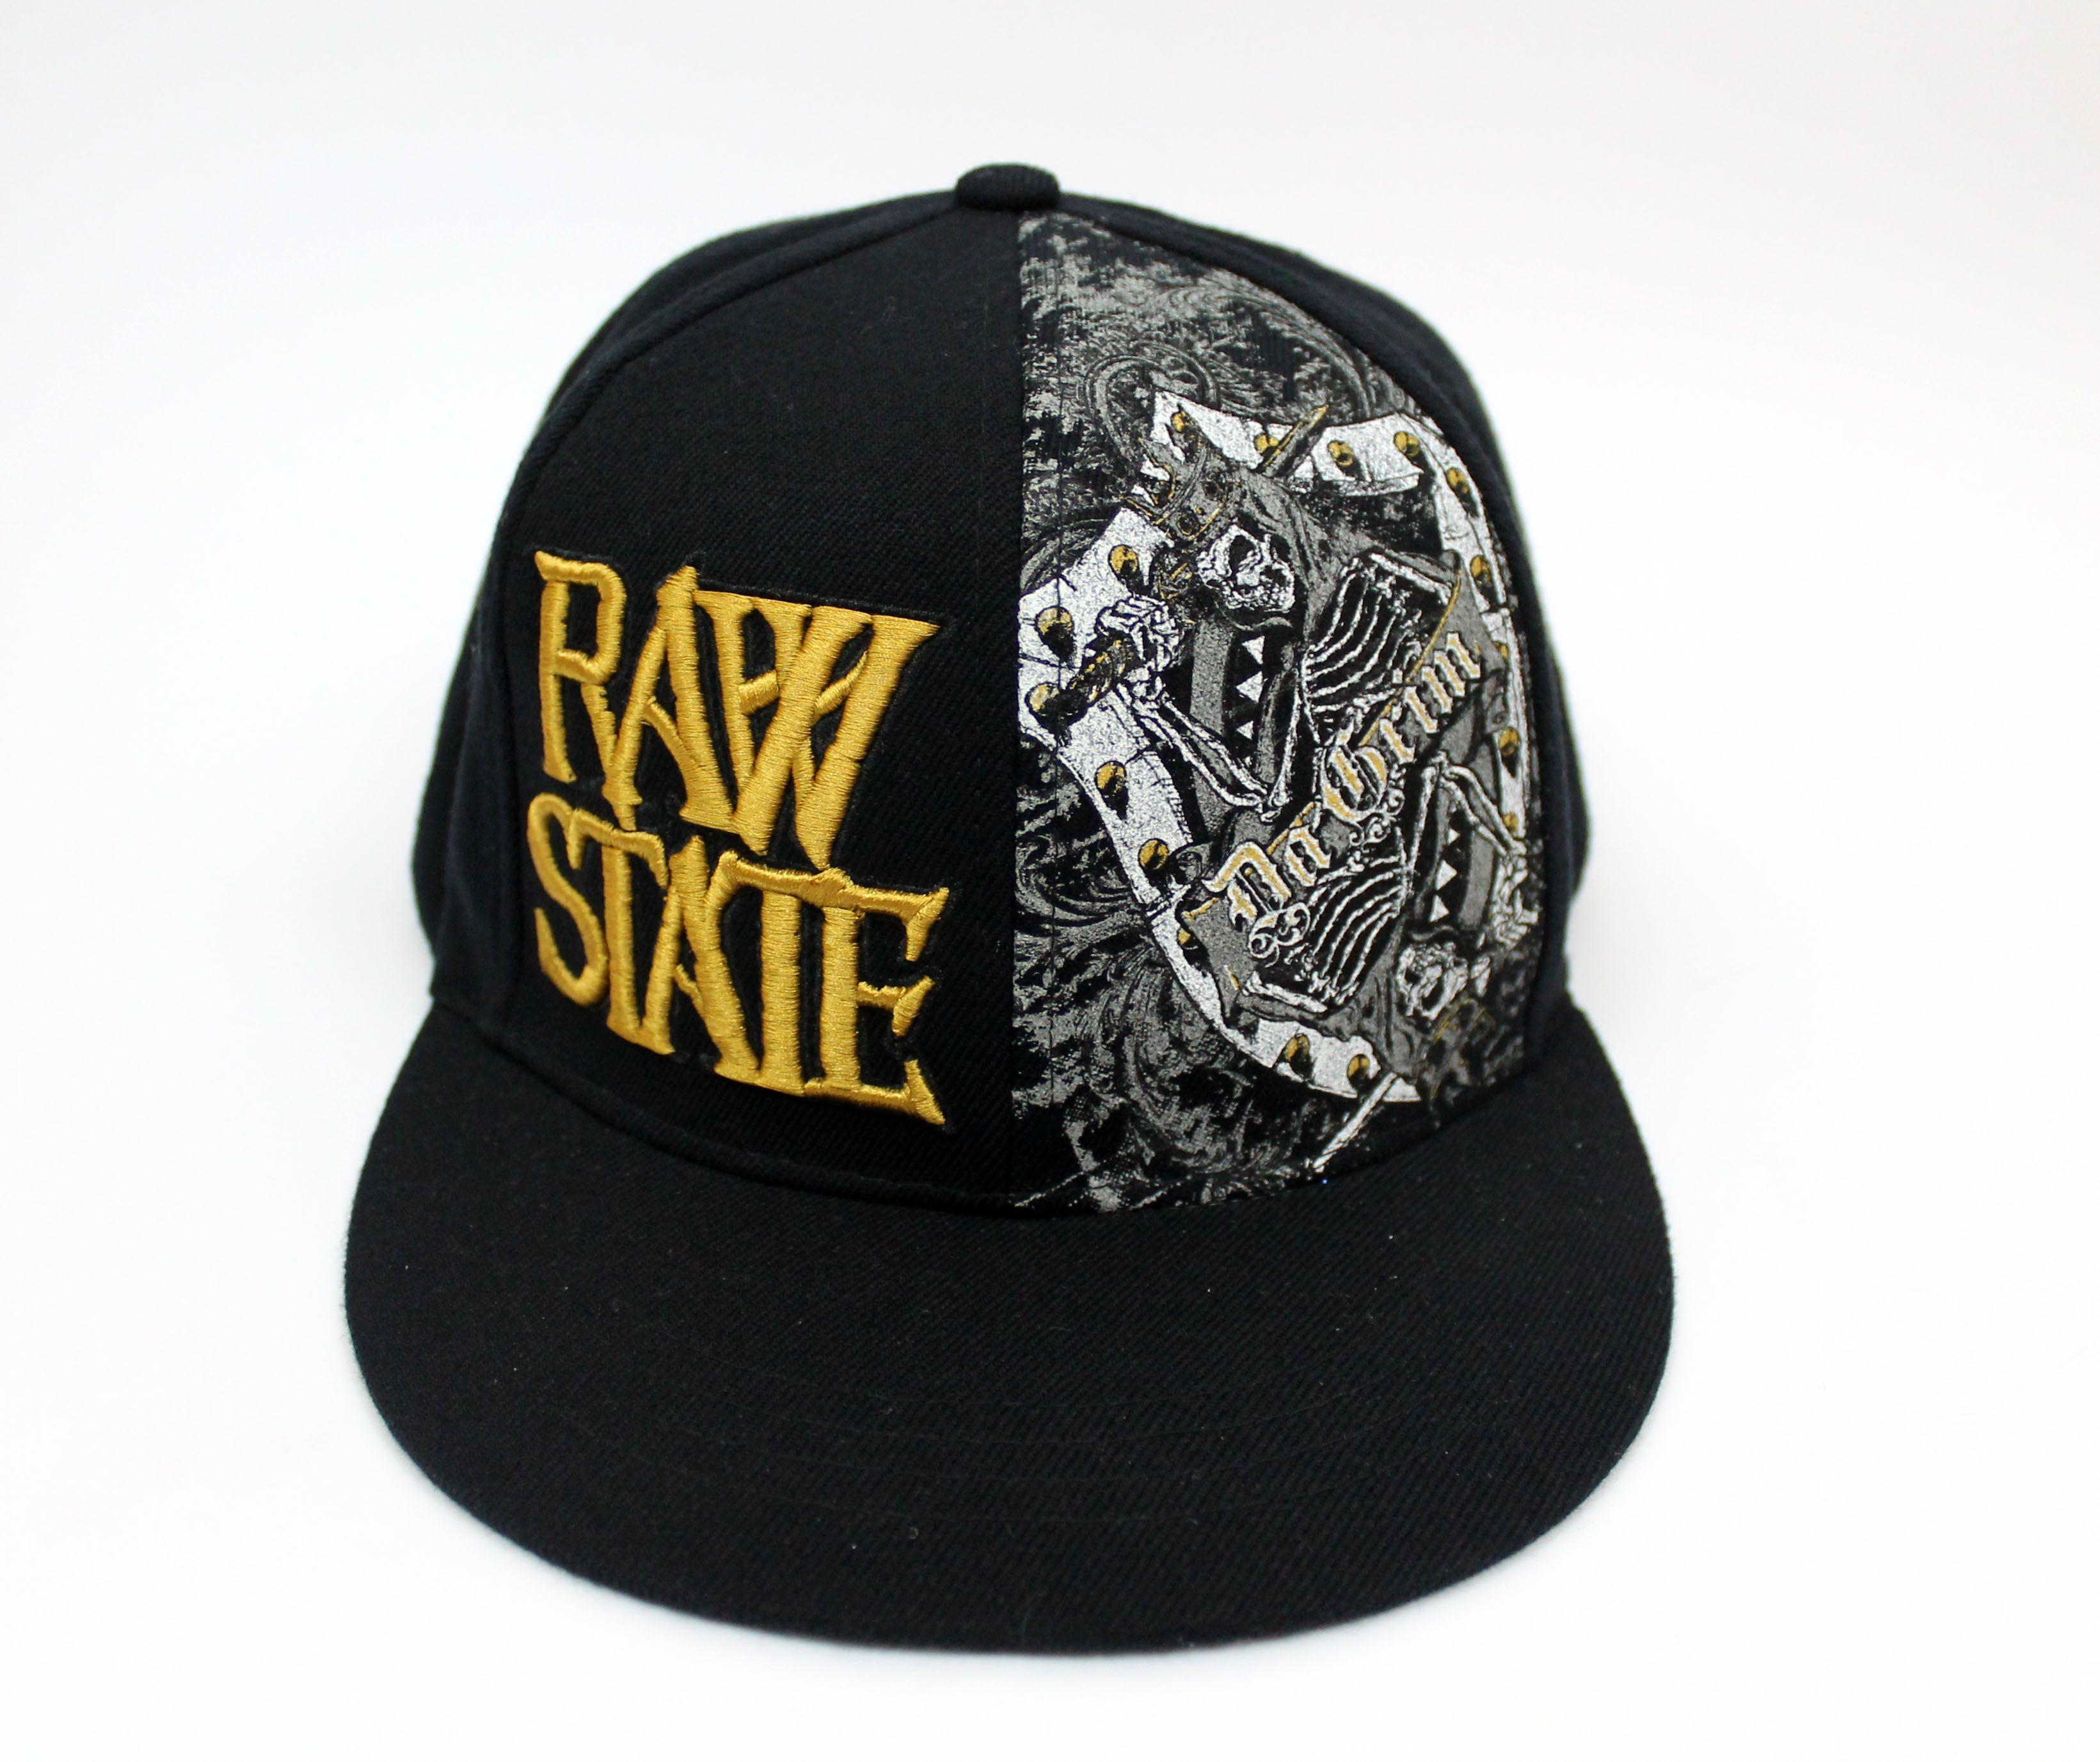 Raw State Hat